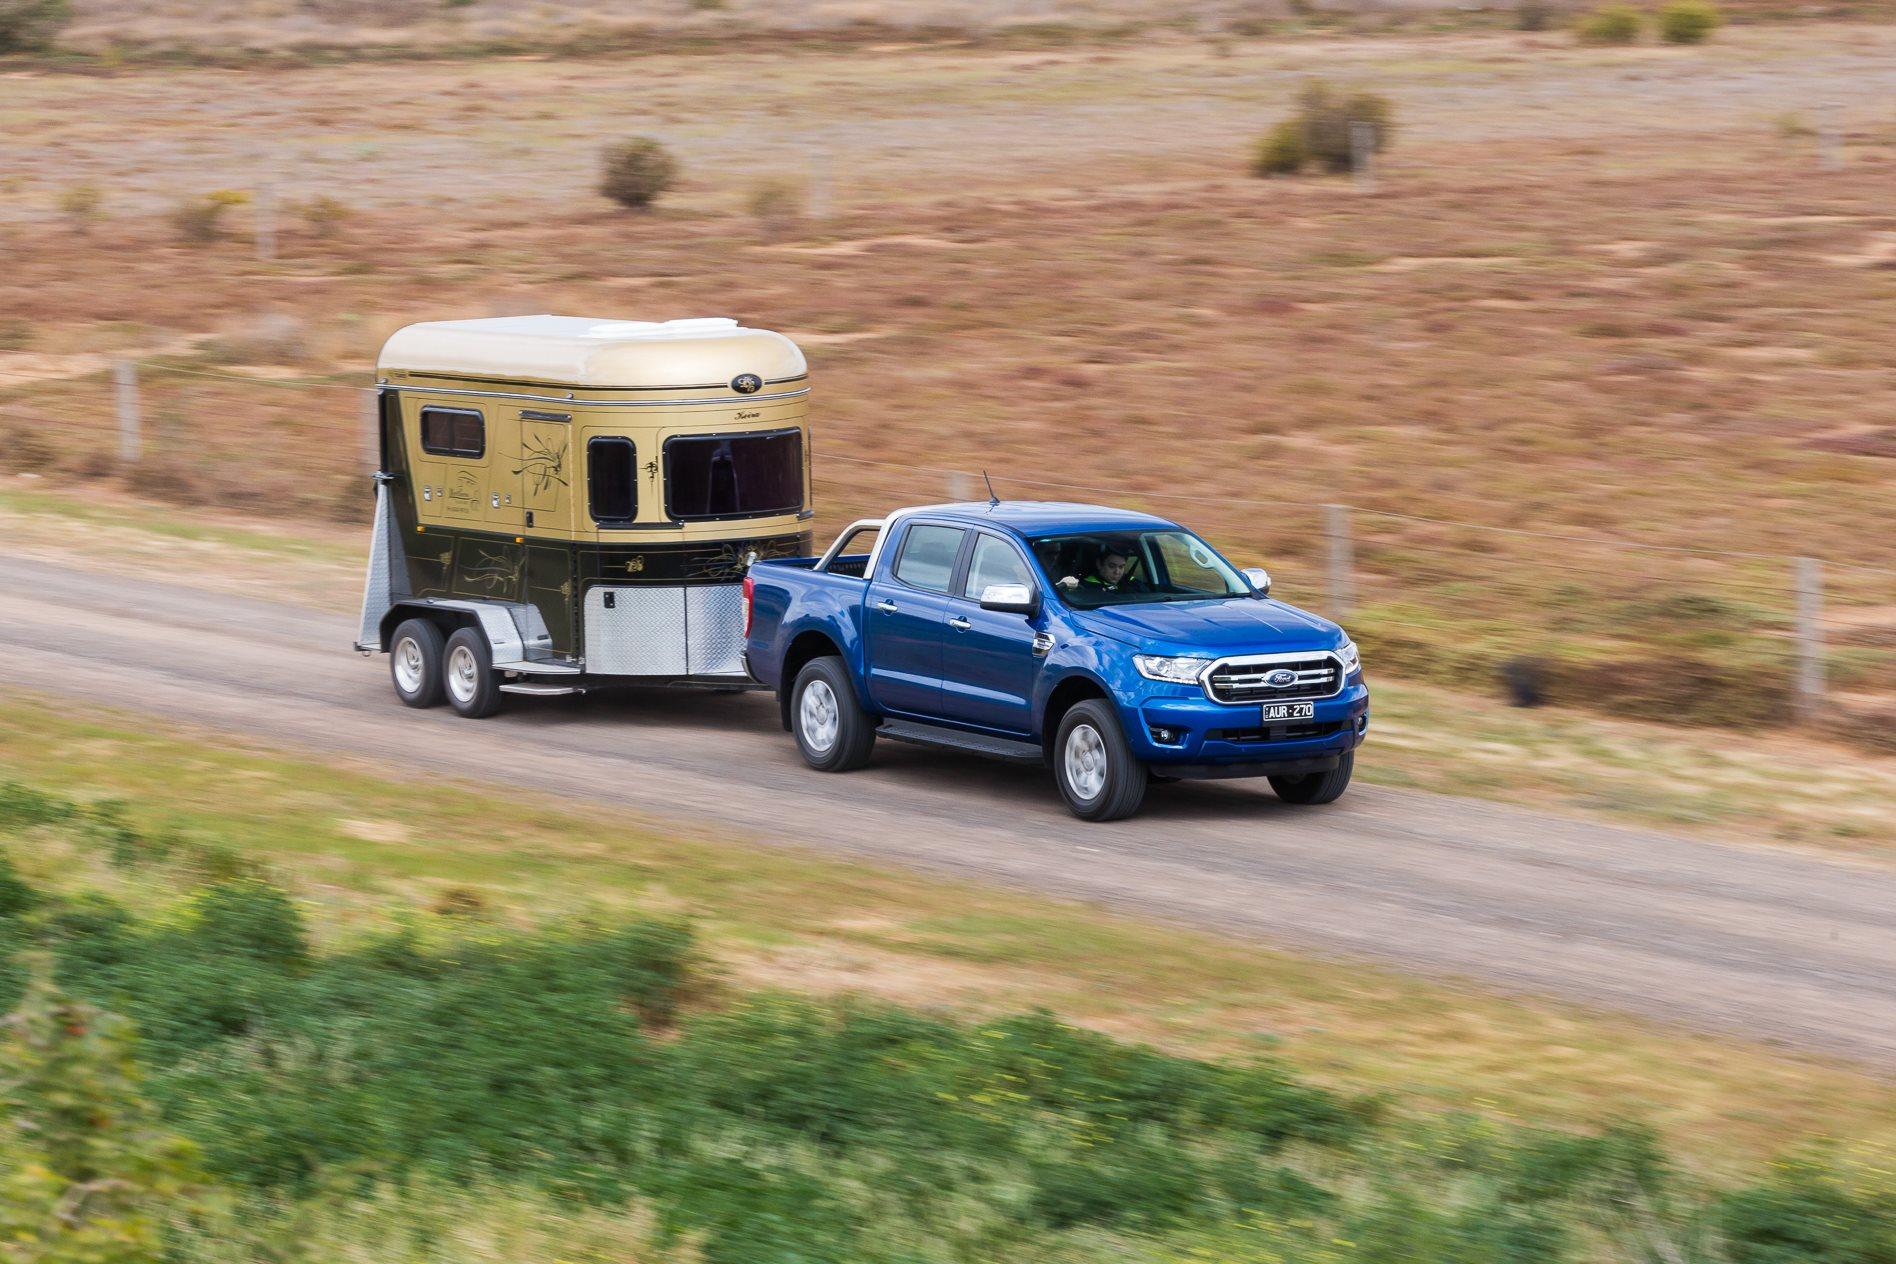 Ford Ranger 2018 kéo phao ngựa